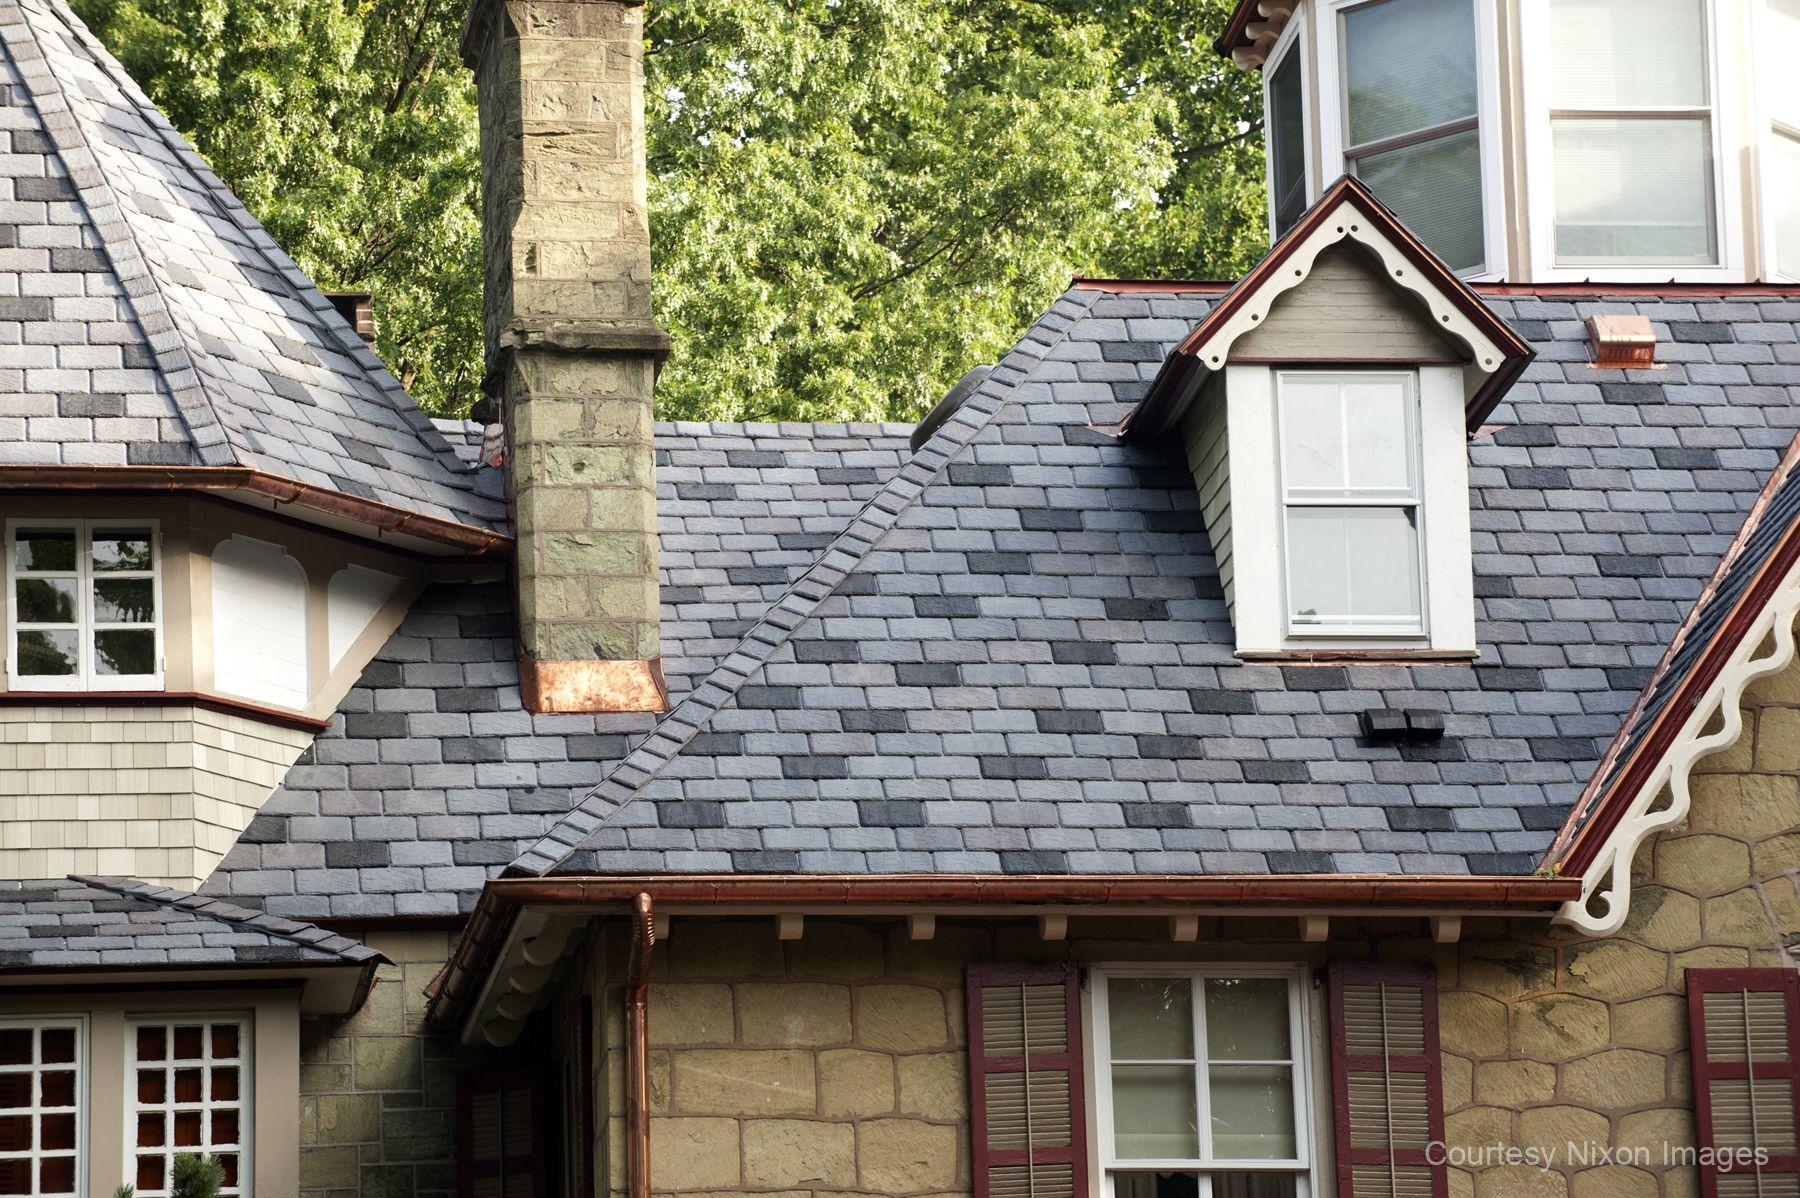 12 Benefits Of Synthetic Slate Roofing For Wayne Il Homes Synthetic Slate Roofing Roofing Slate Roof